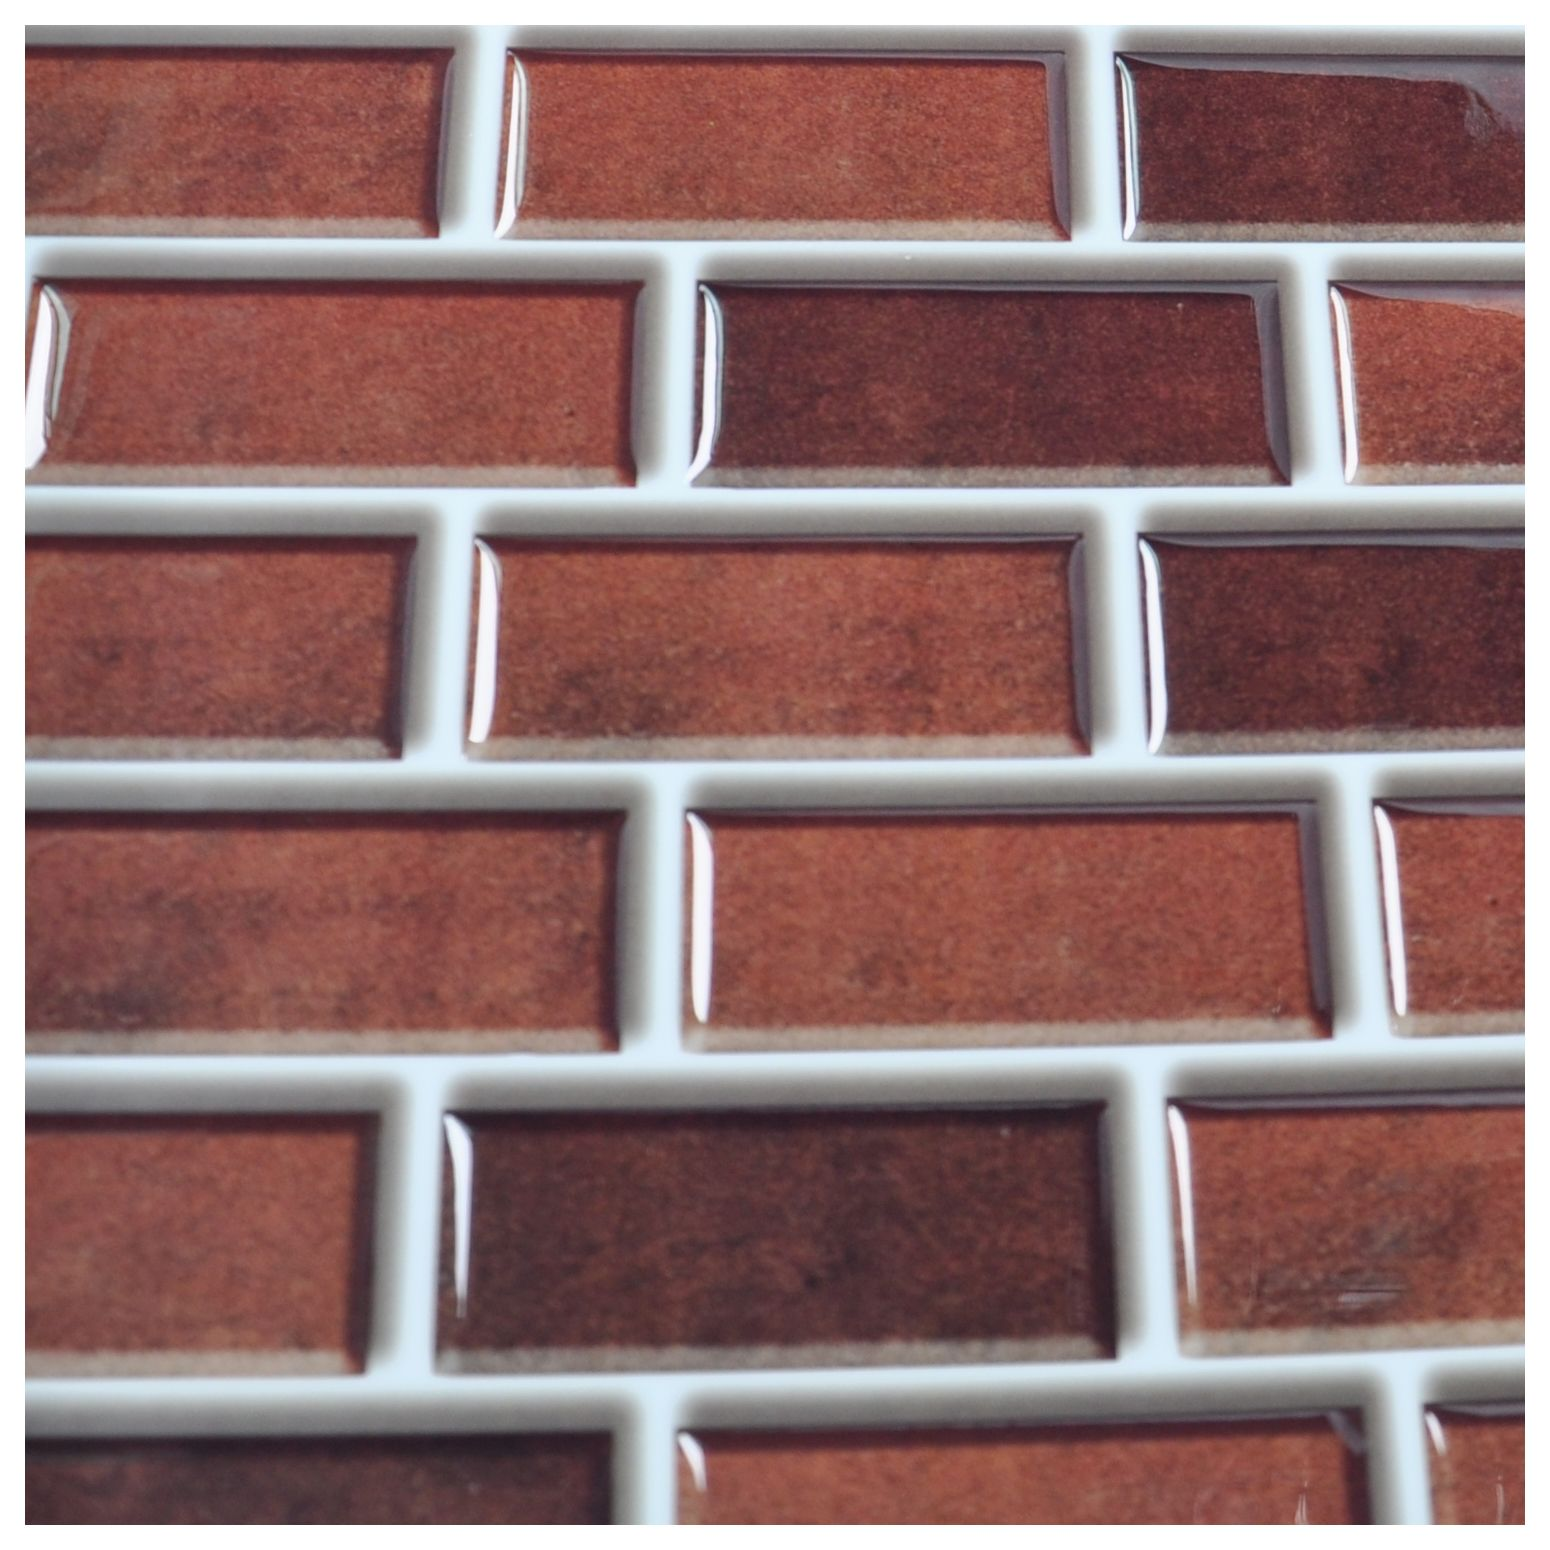 peel and stick brick backsplash tiles interior ideas pinterest